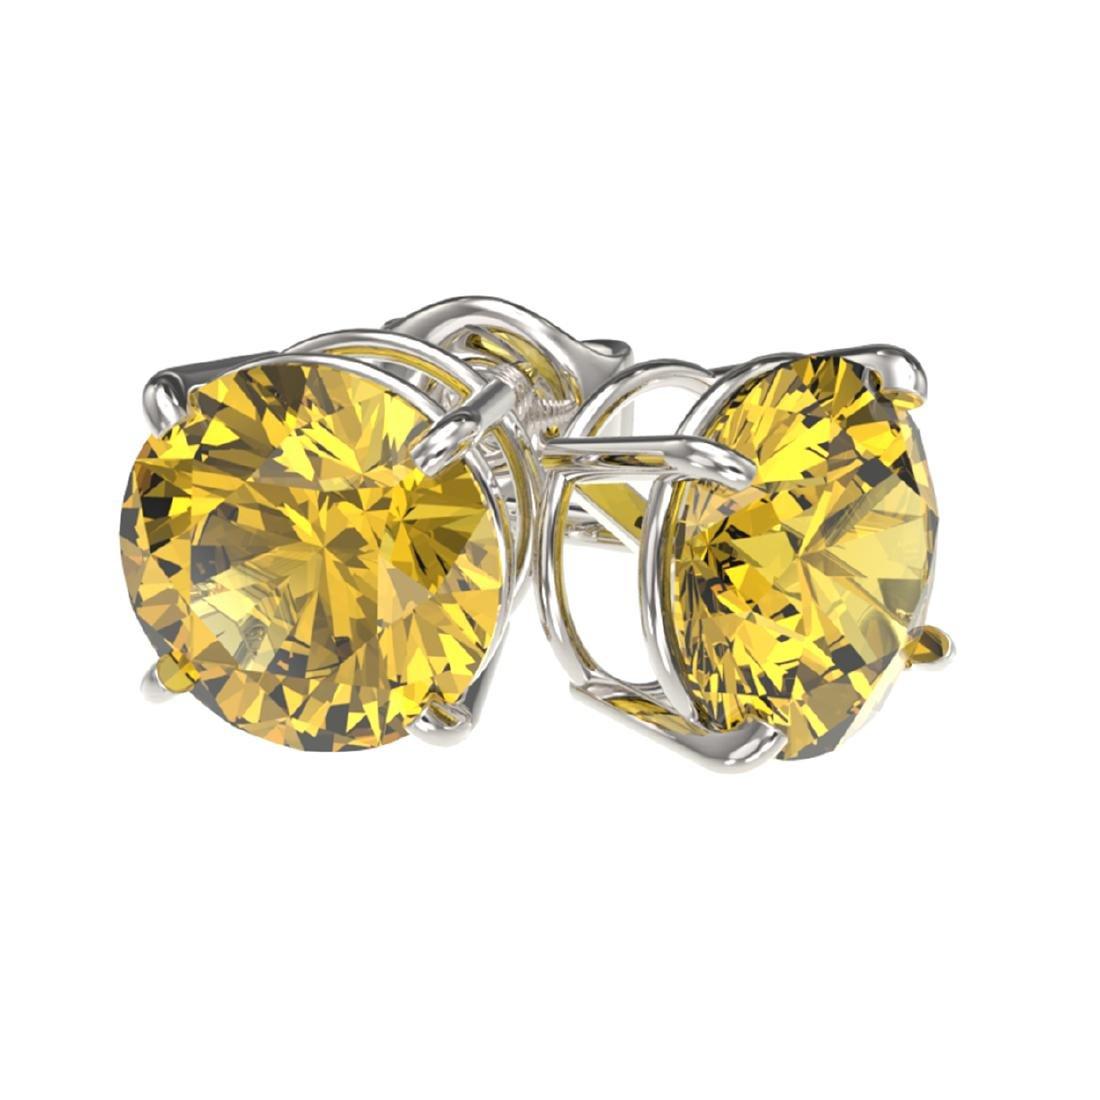 2.04 ctw Intense Yellow Diamond Stud Earrings 10K White - 3